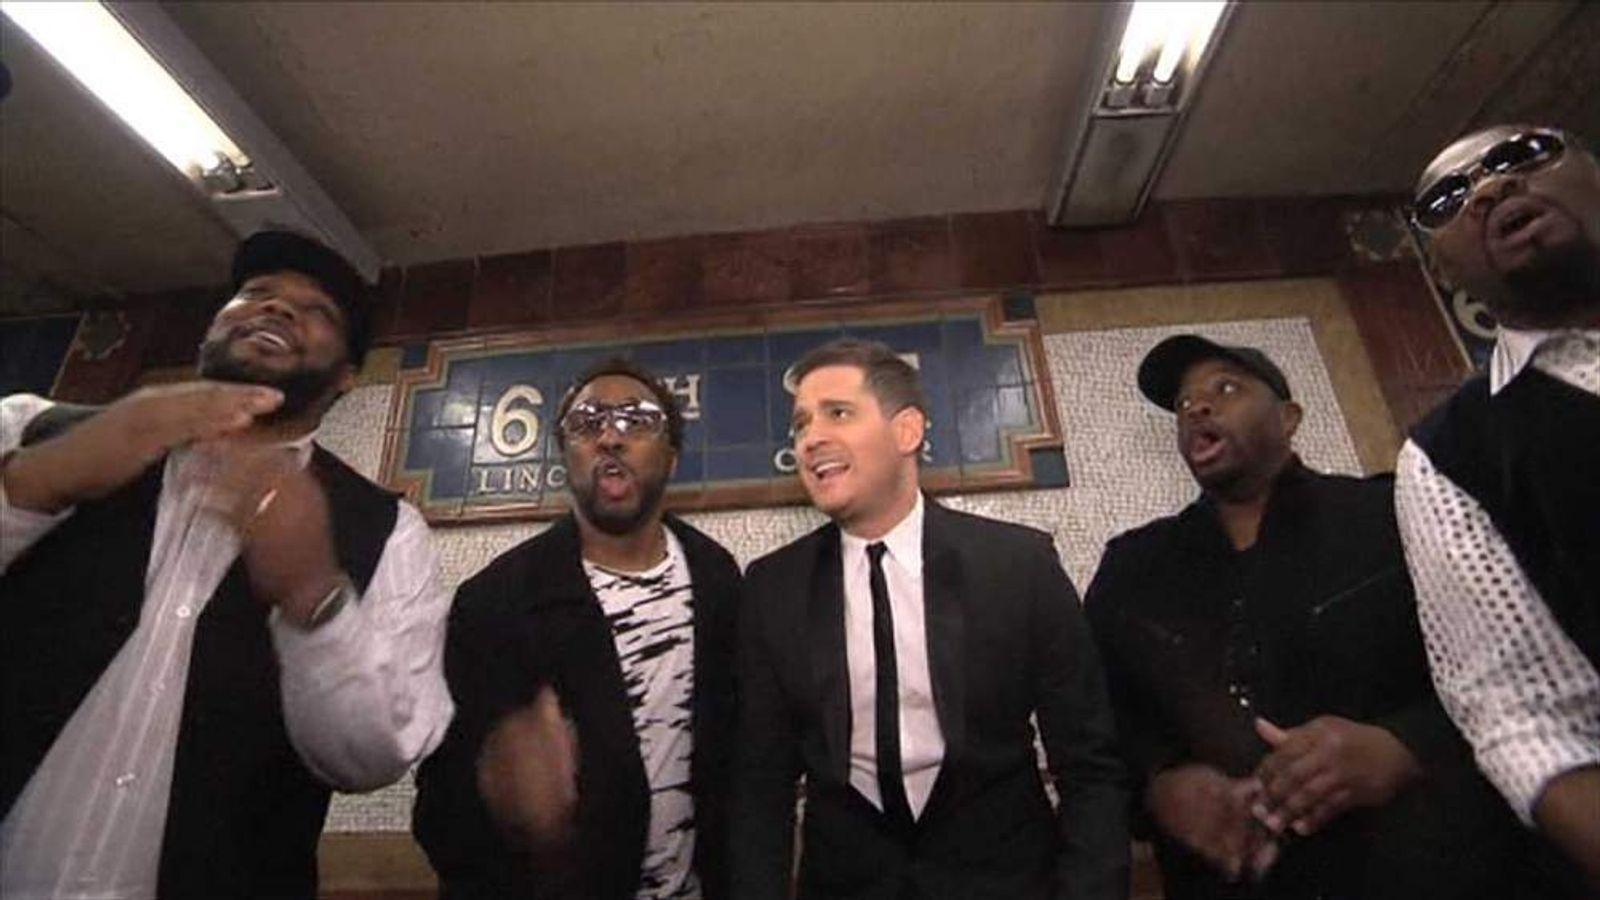 Michael Buble singing in New York subway